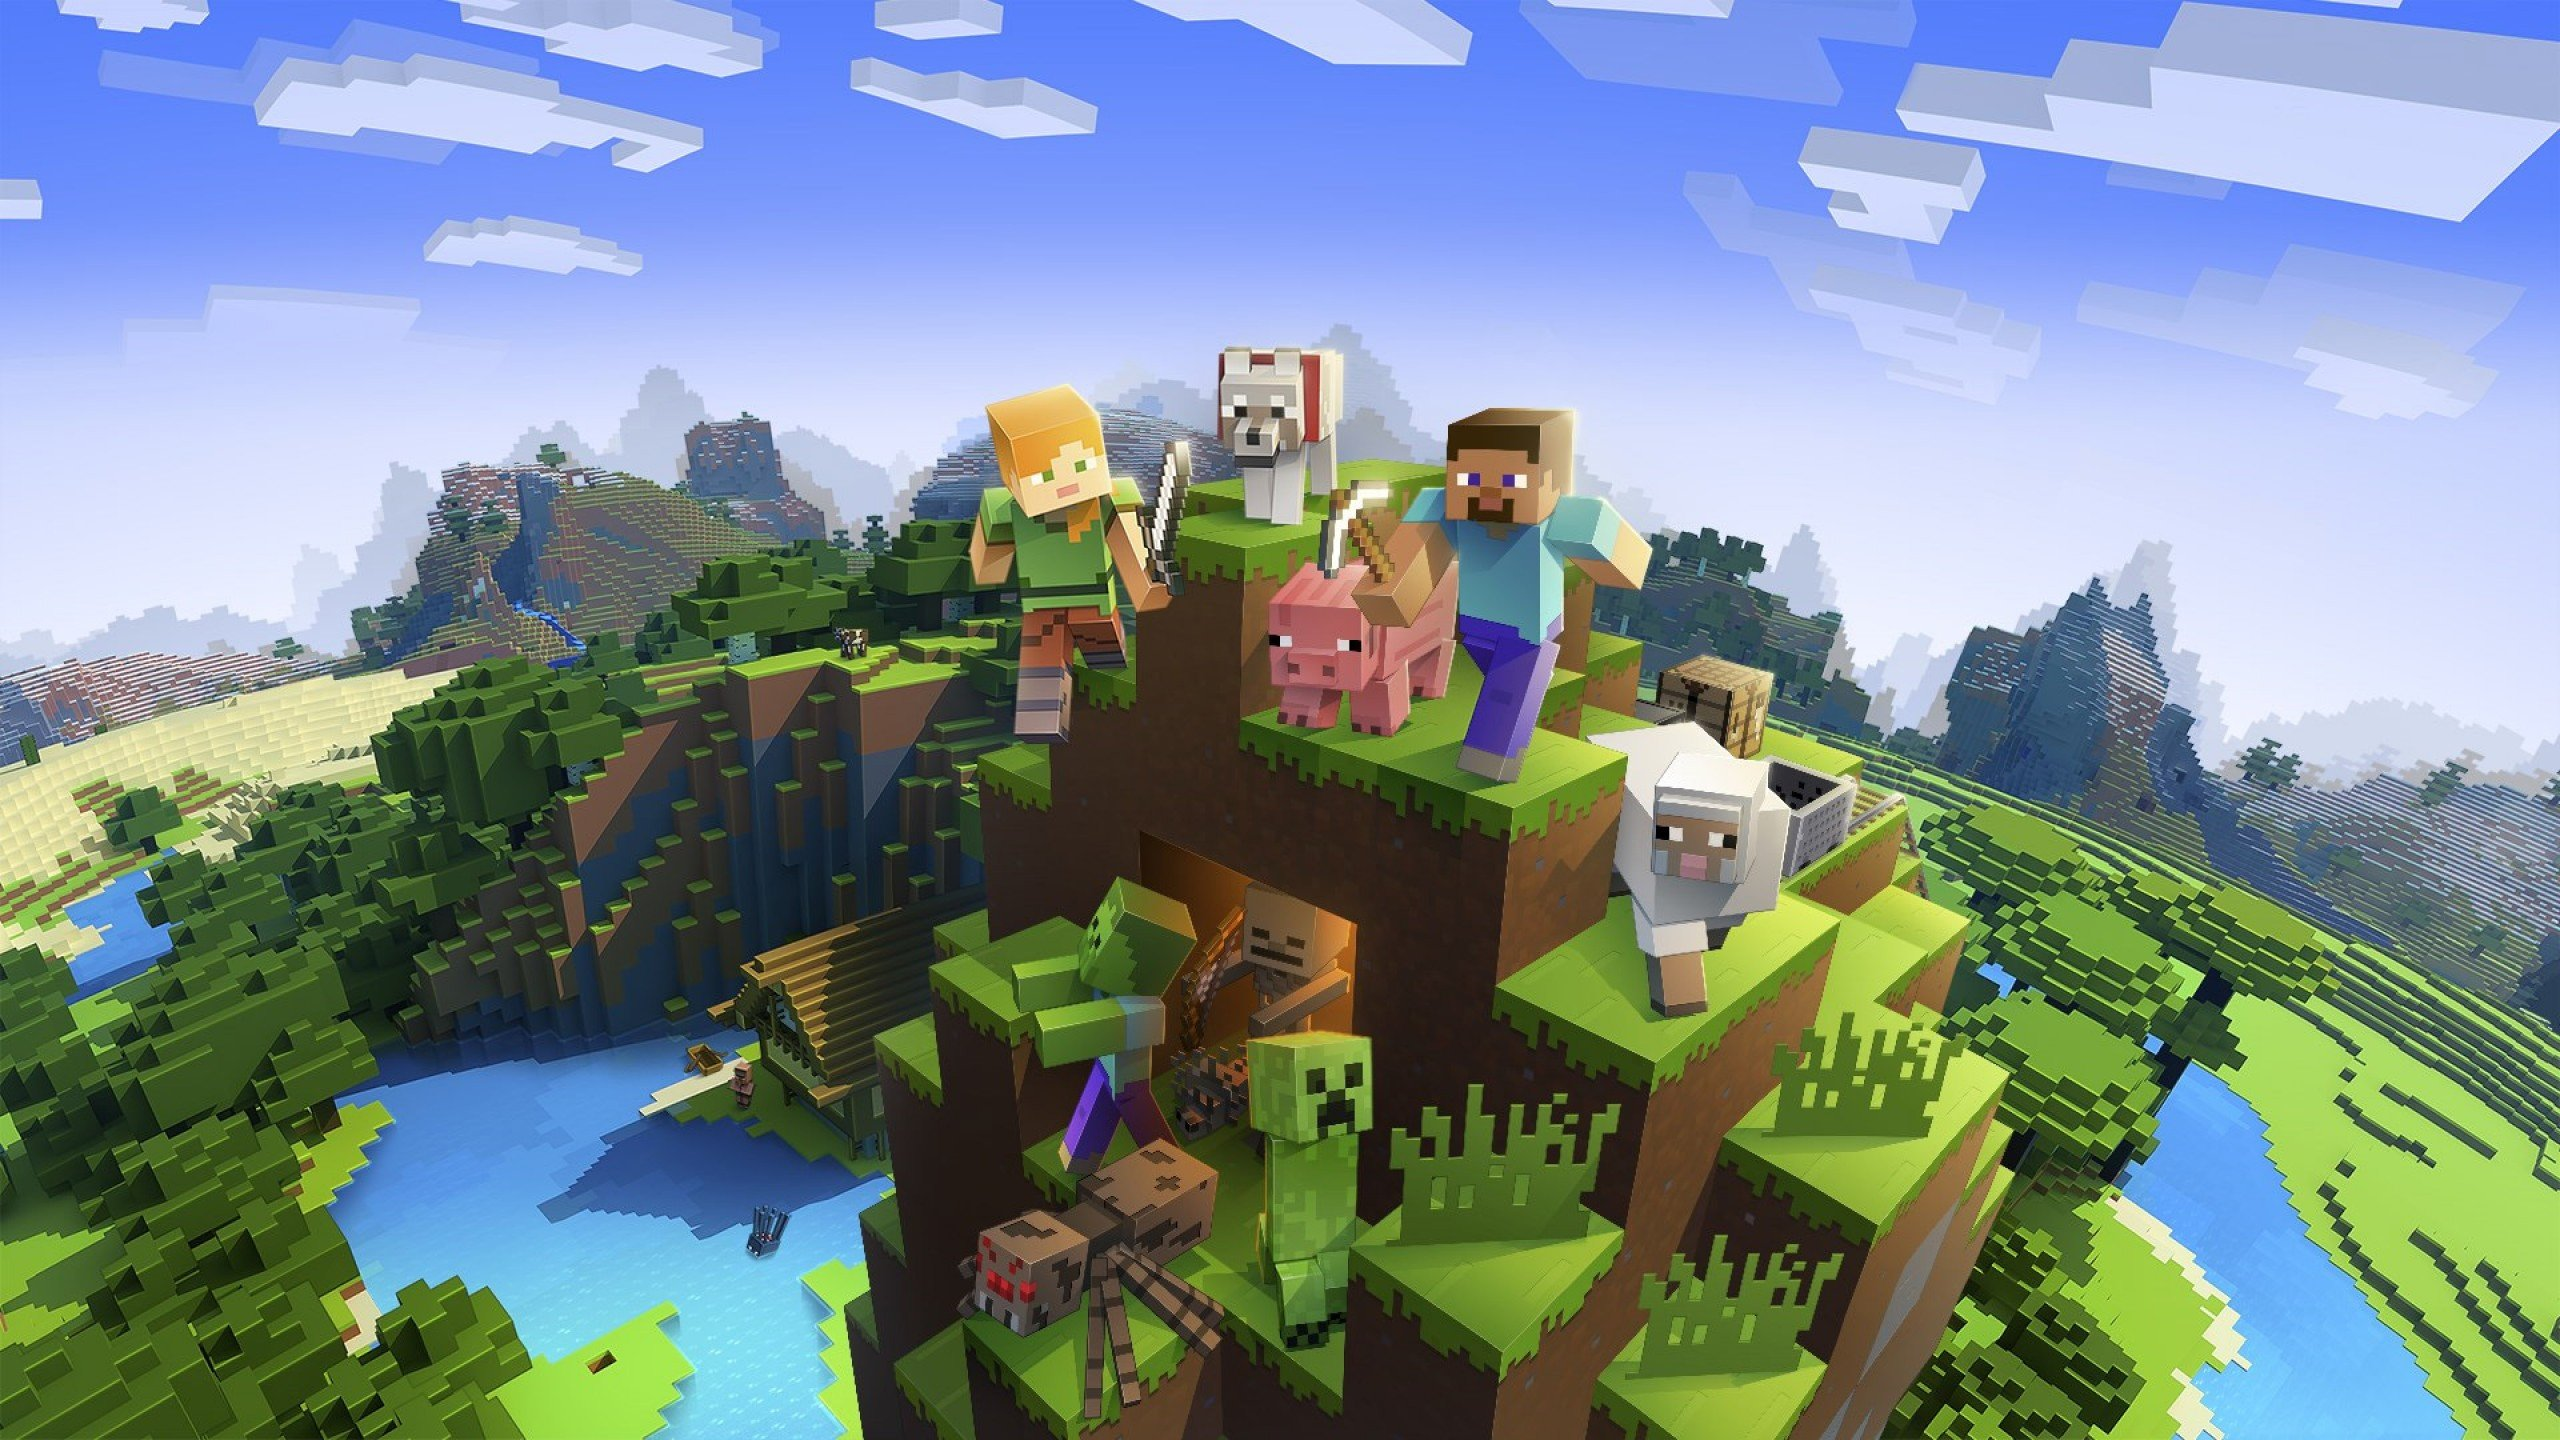 Free Download Minecraft Wallpaper Webgameappcom 2560x1440 For